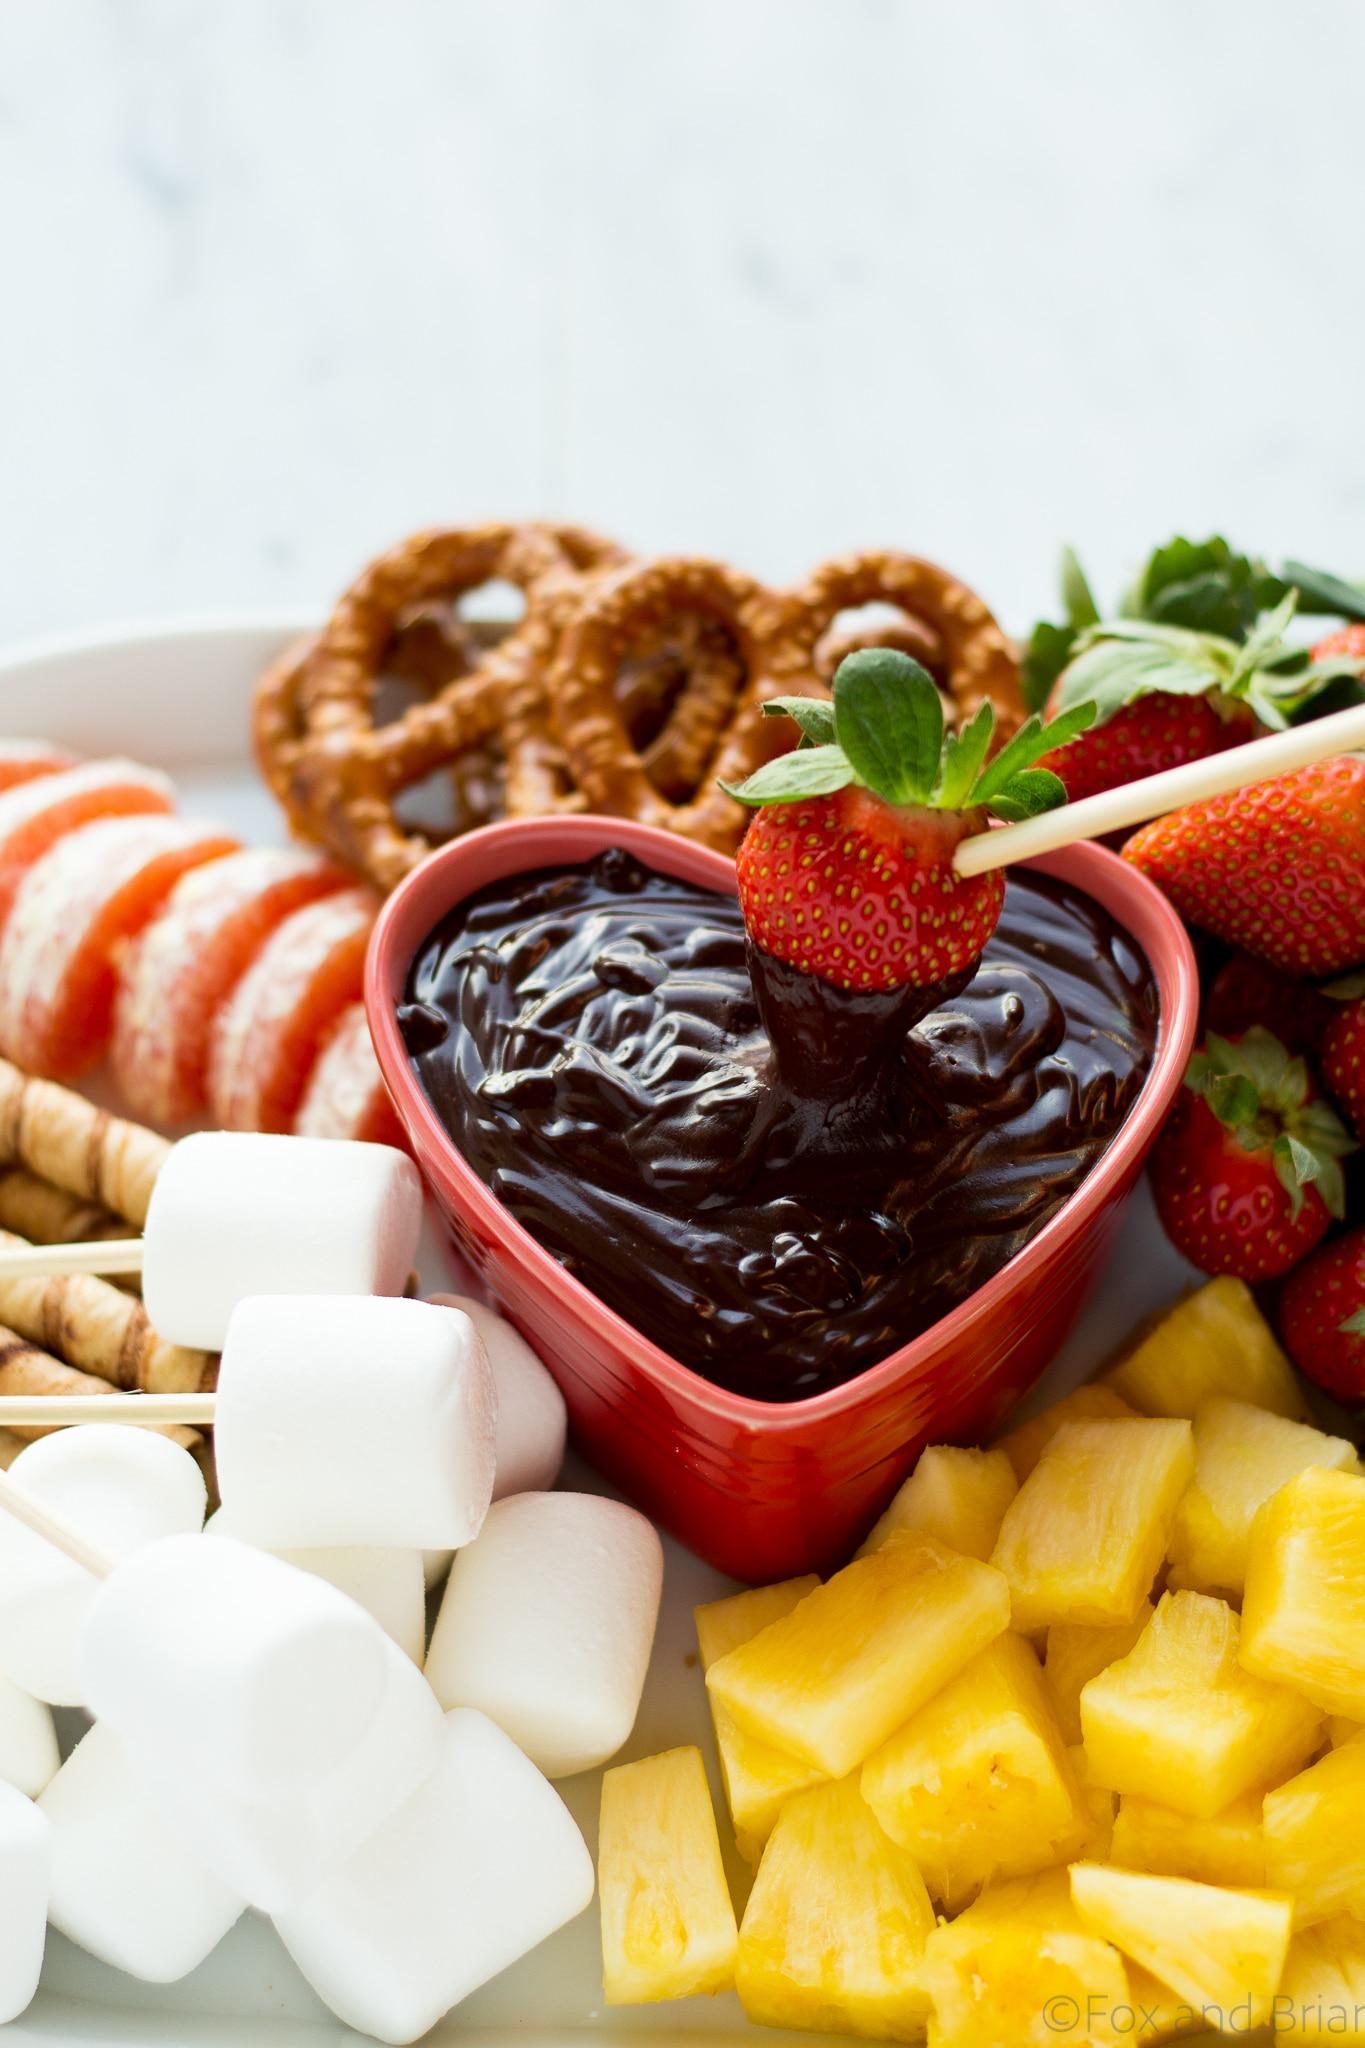 Chocolate Fondue - Fox and Briar